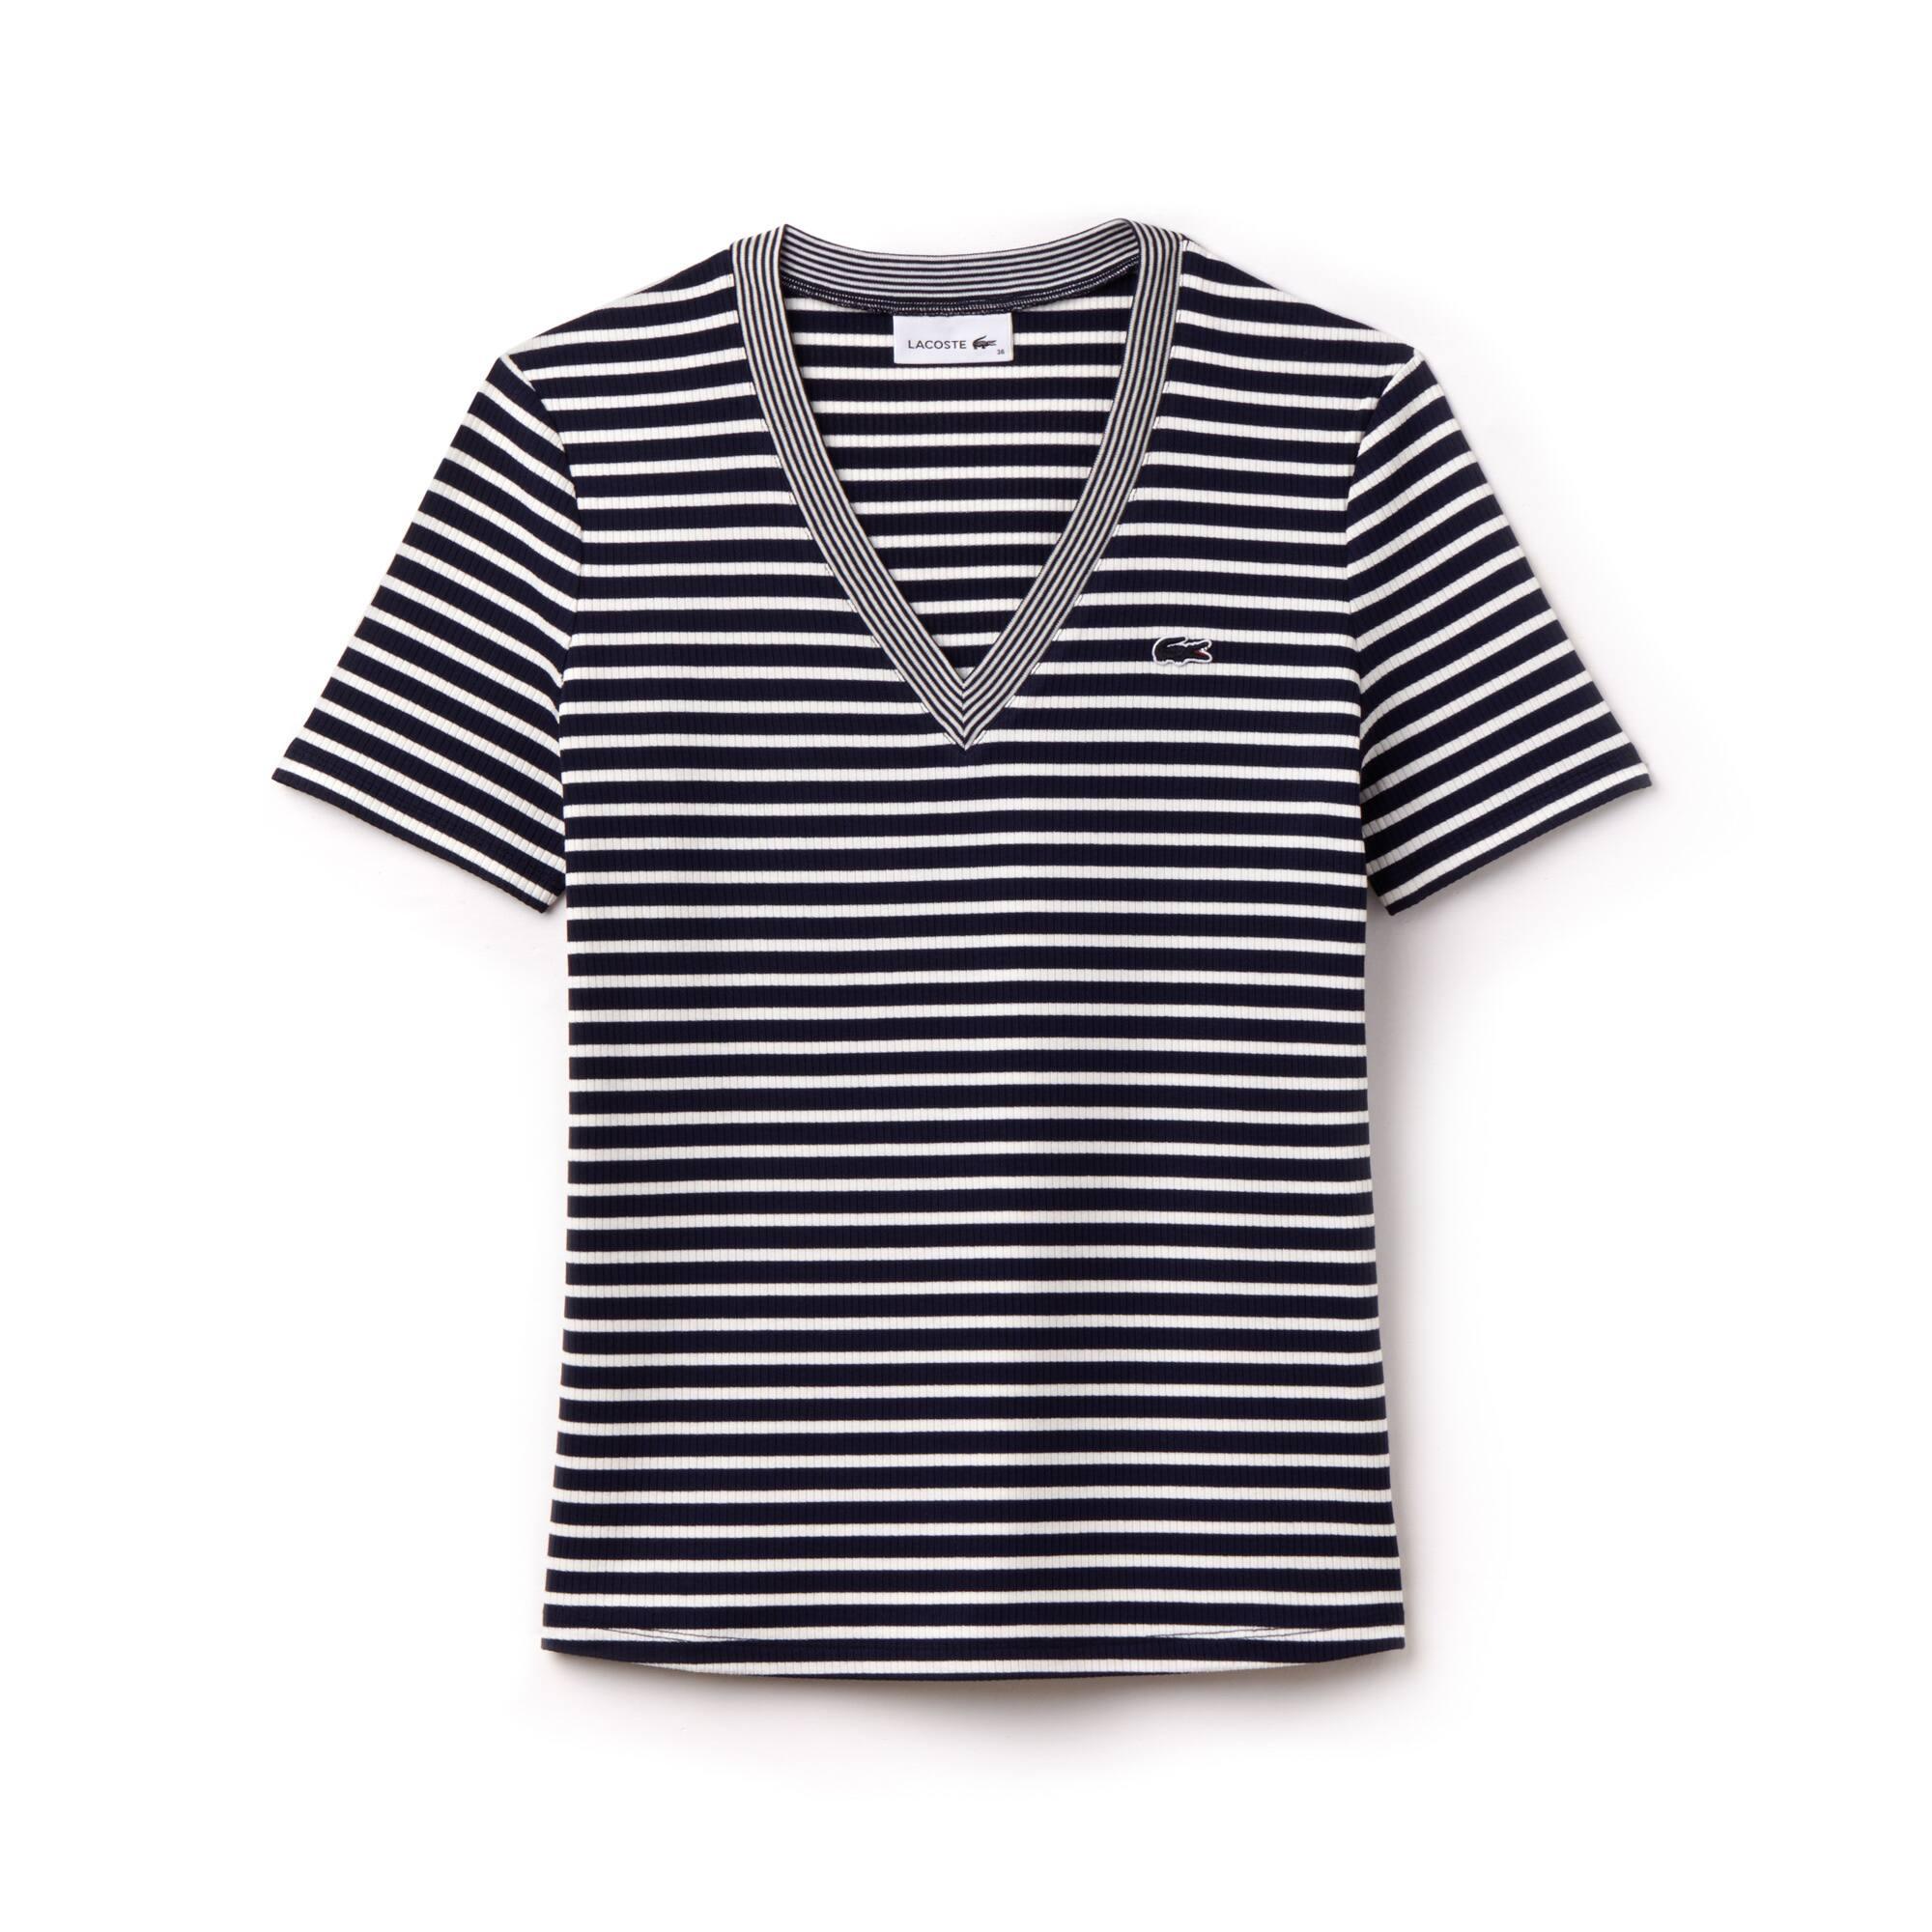 Damen-T-Shirt aus gestreifter Stretch-Baumwolle mit V-Ausschnitt